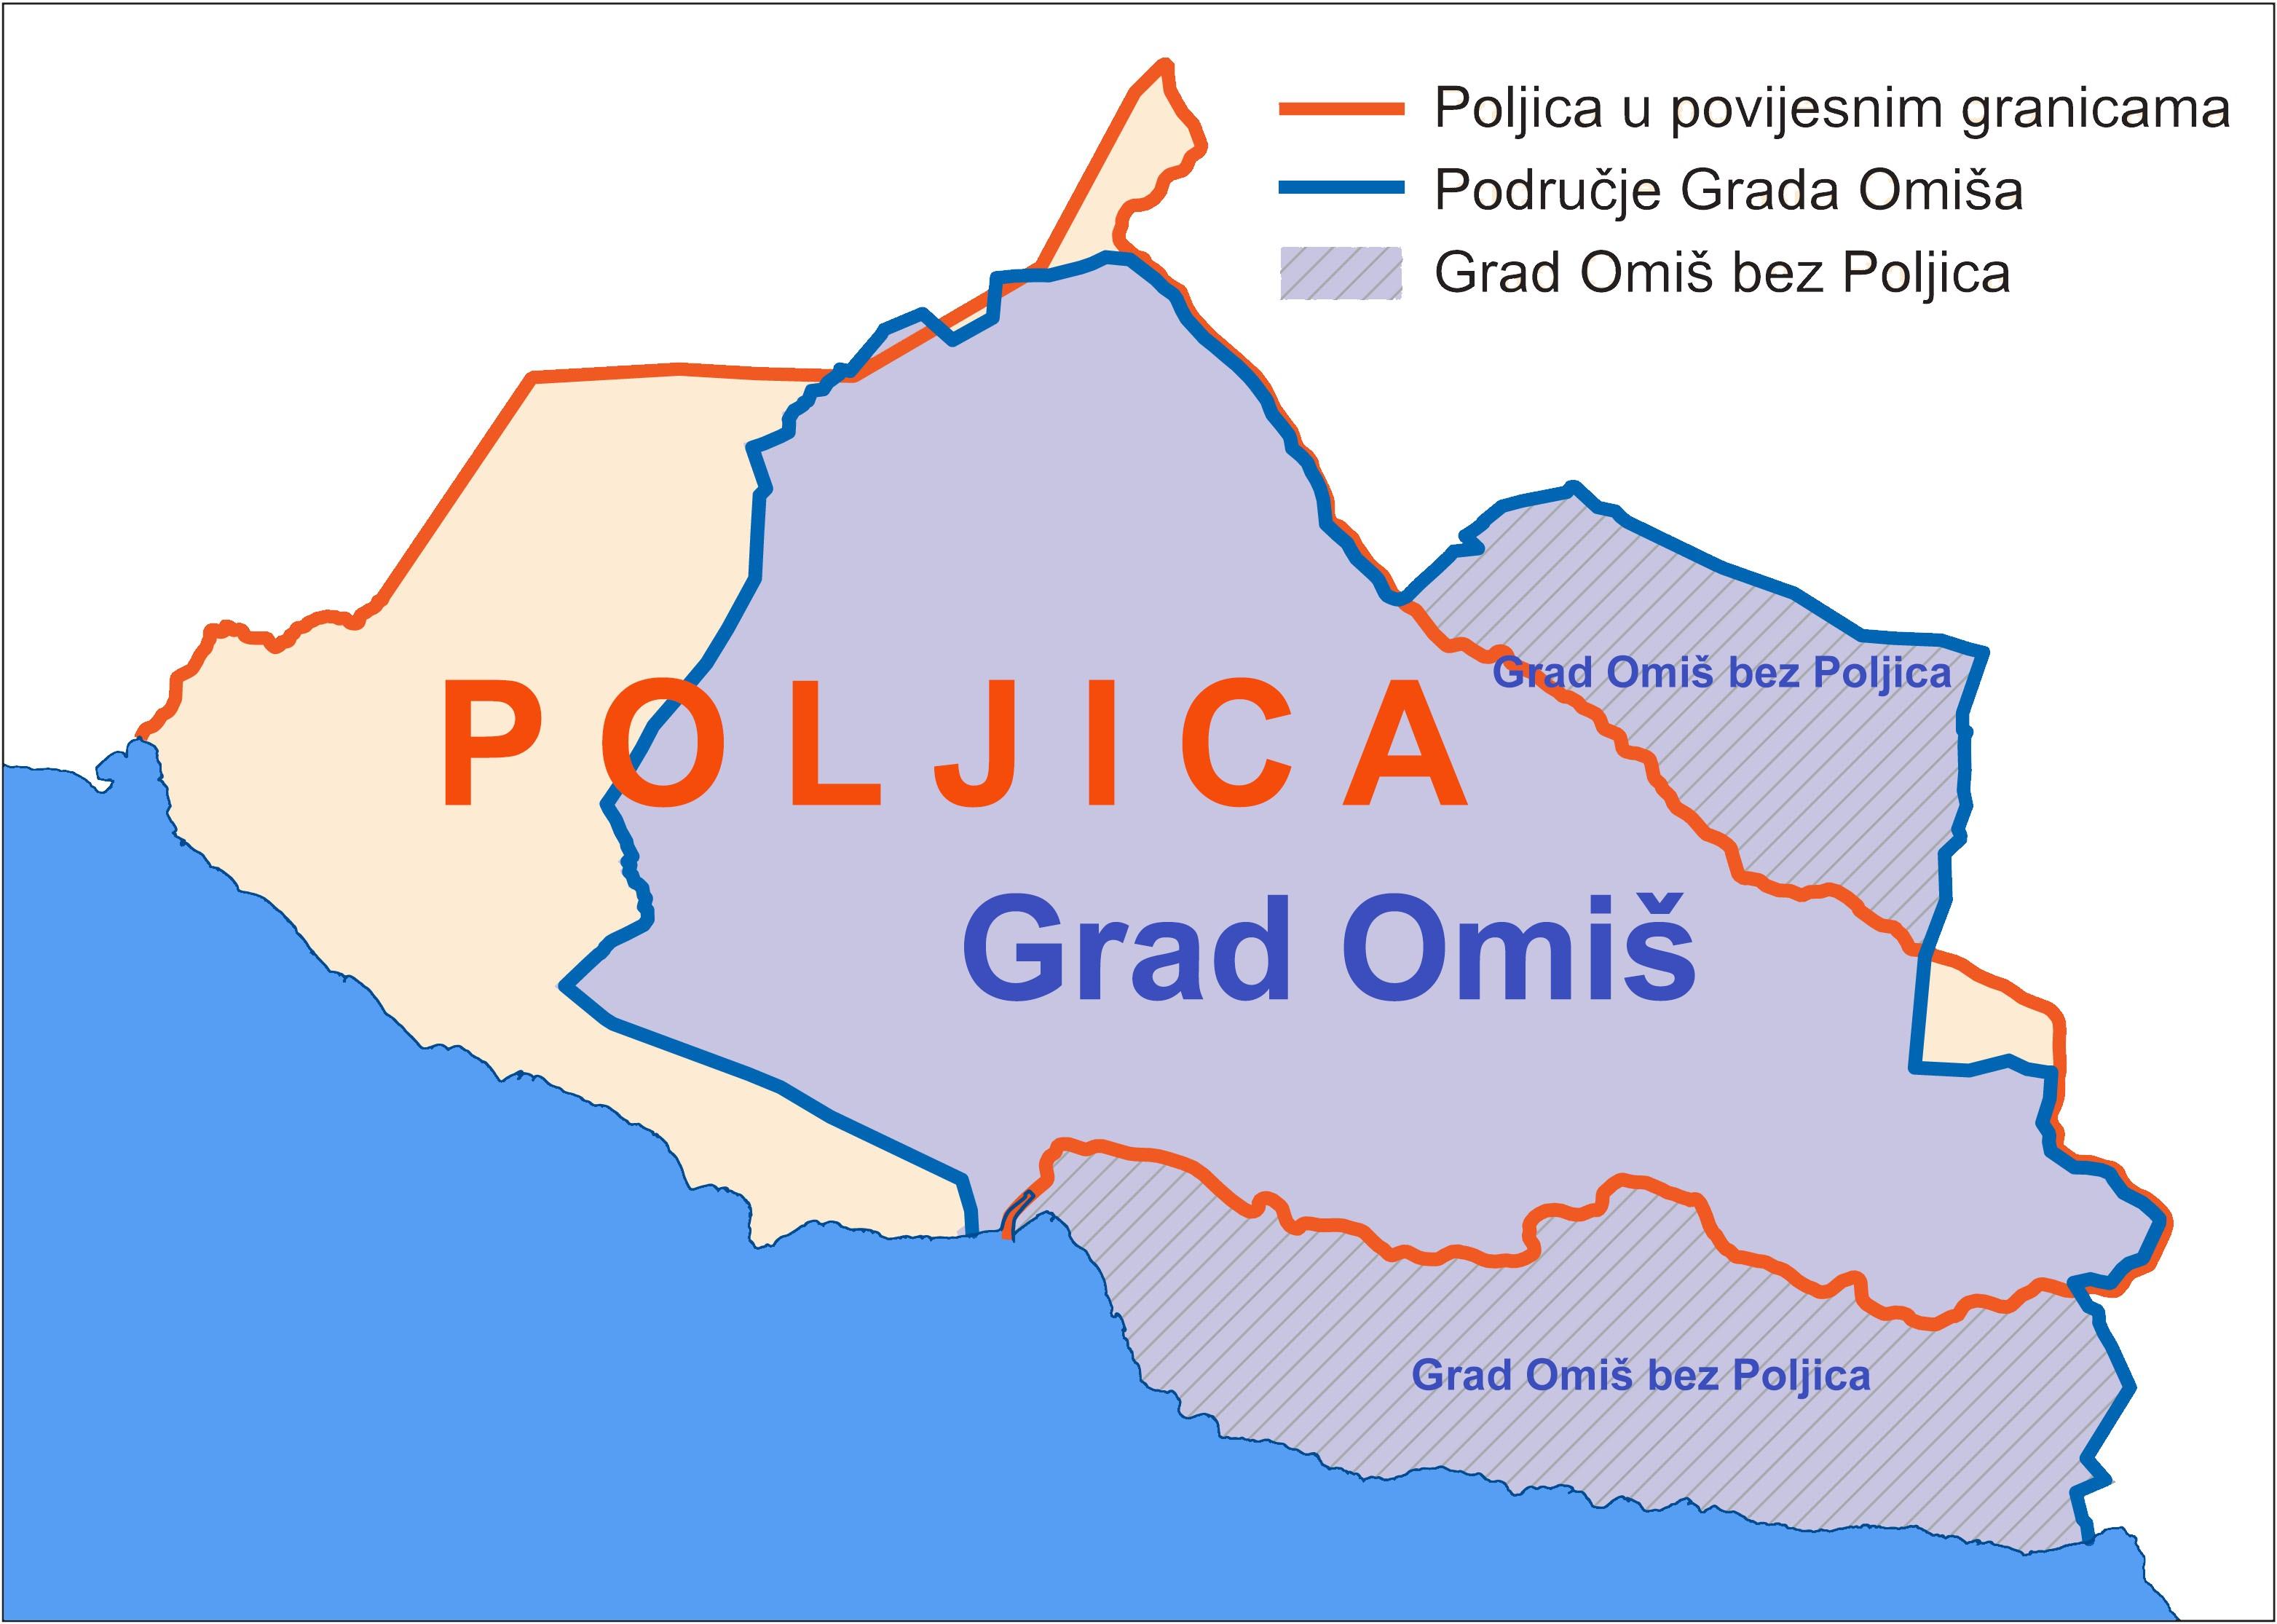 BEZ RAZVOJA POLJICA NEMA NI RAZVOJA GRADA OMIŠA (2)